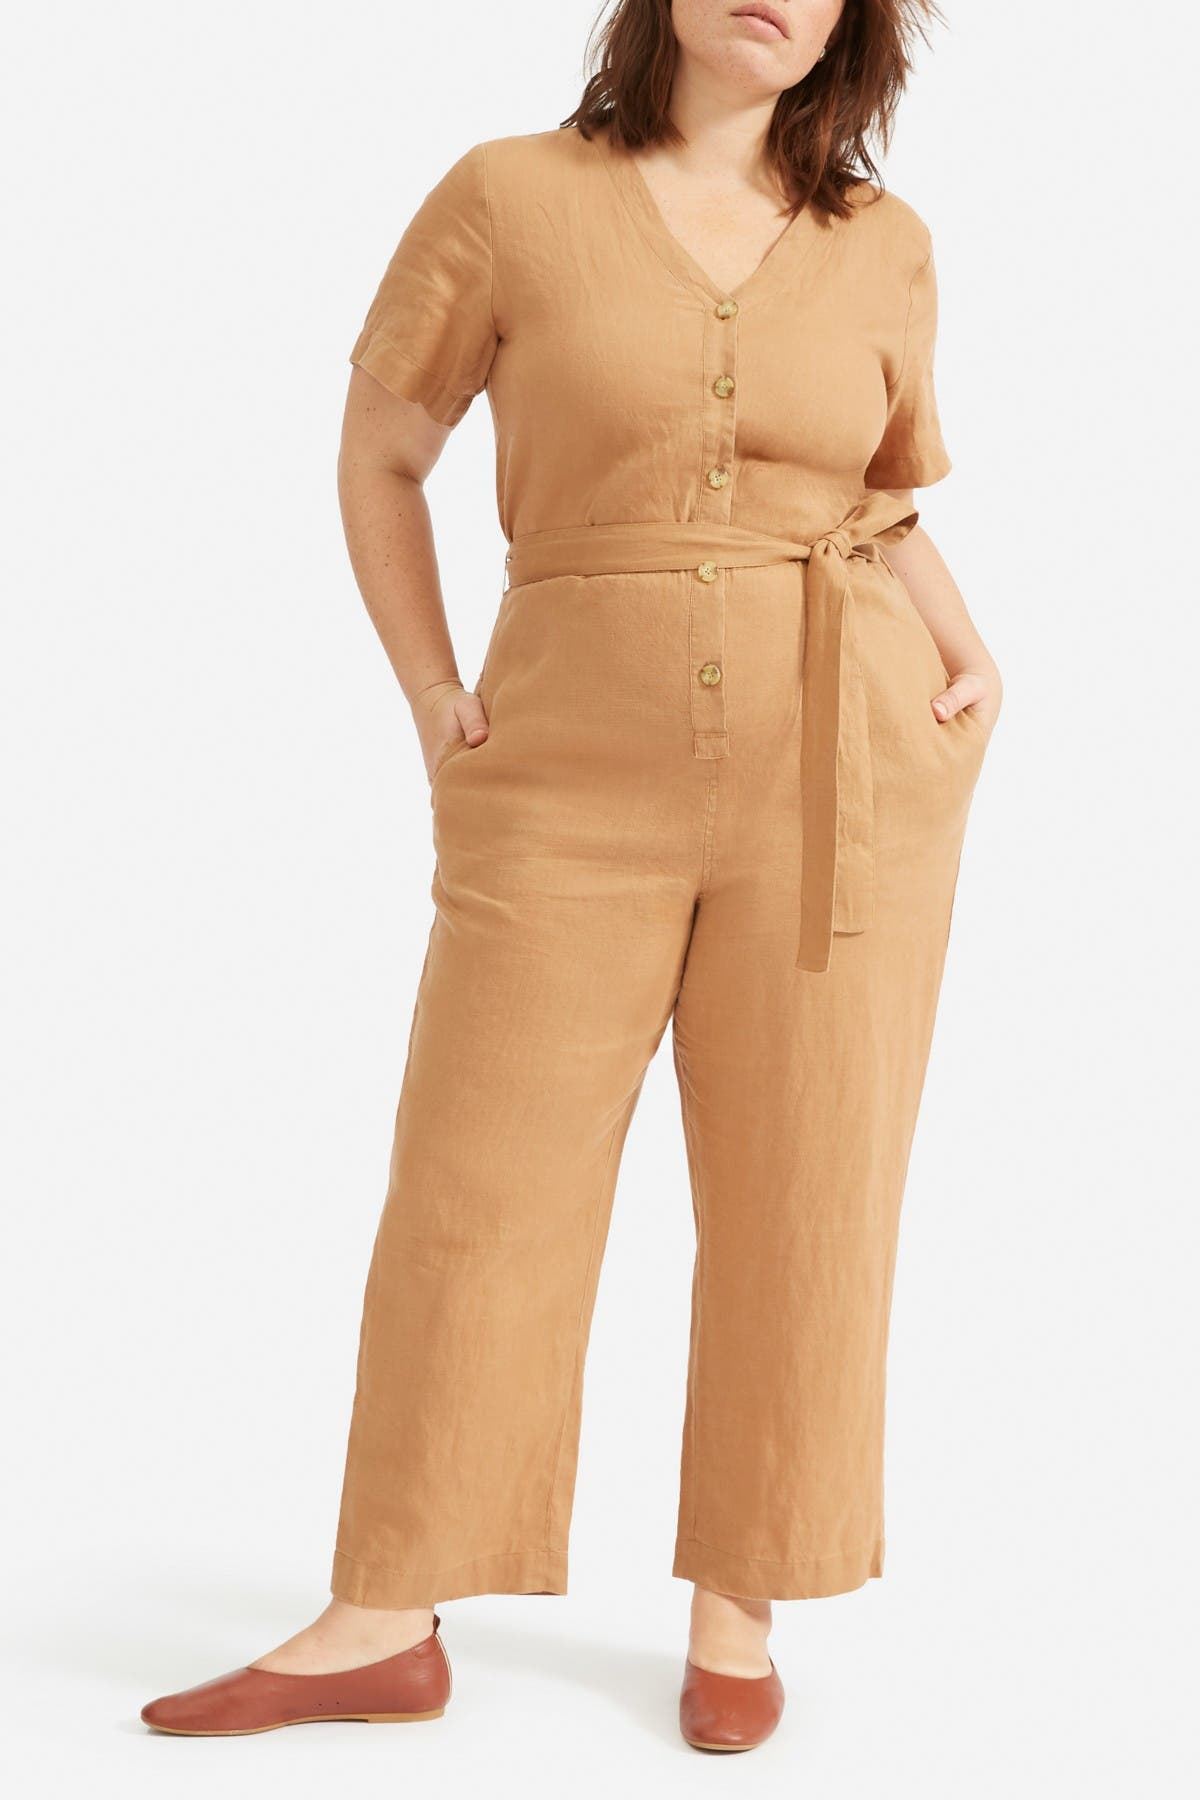 Image of EVERLANE The Linen Short Sleeve Jumpsuit